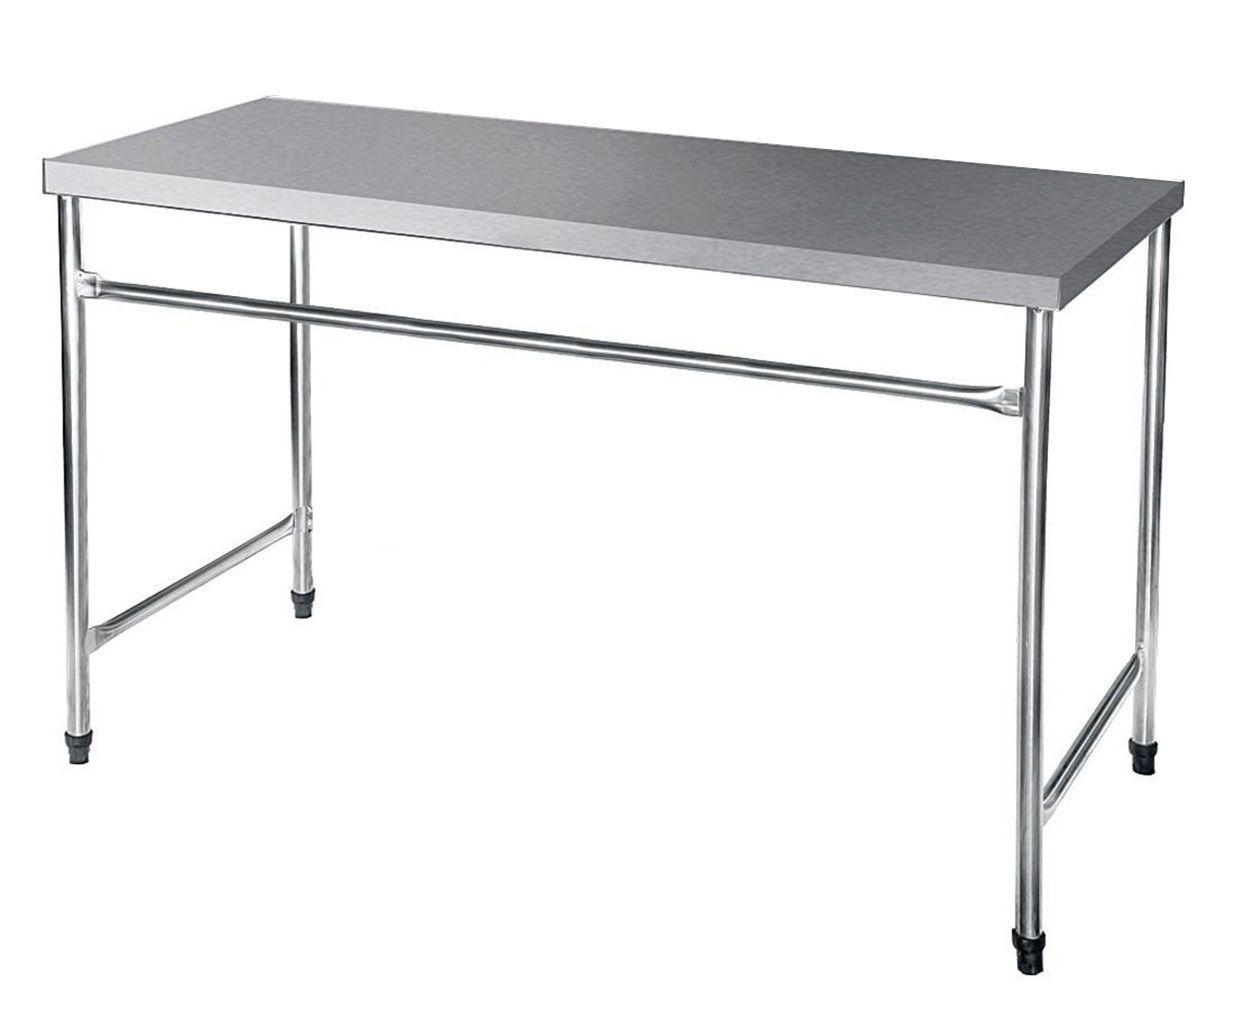 Bancada / Mesa Em Aço Inox (170x60x85)